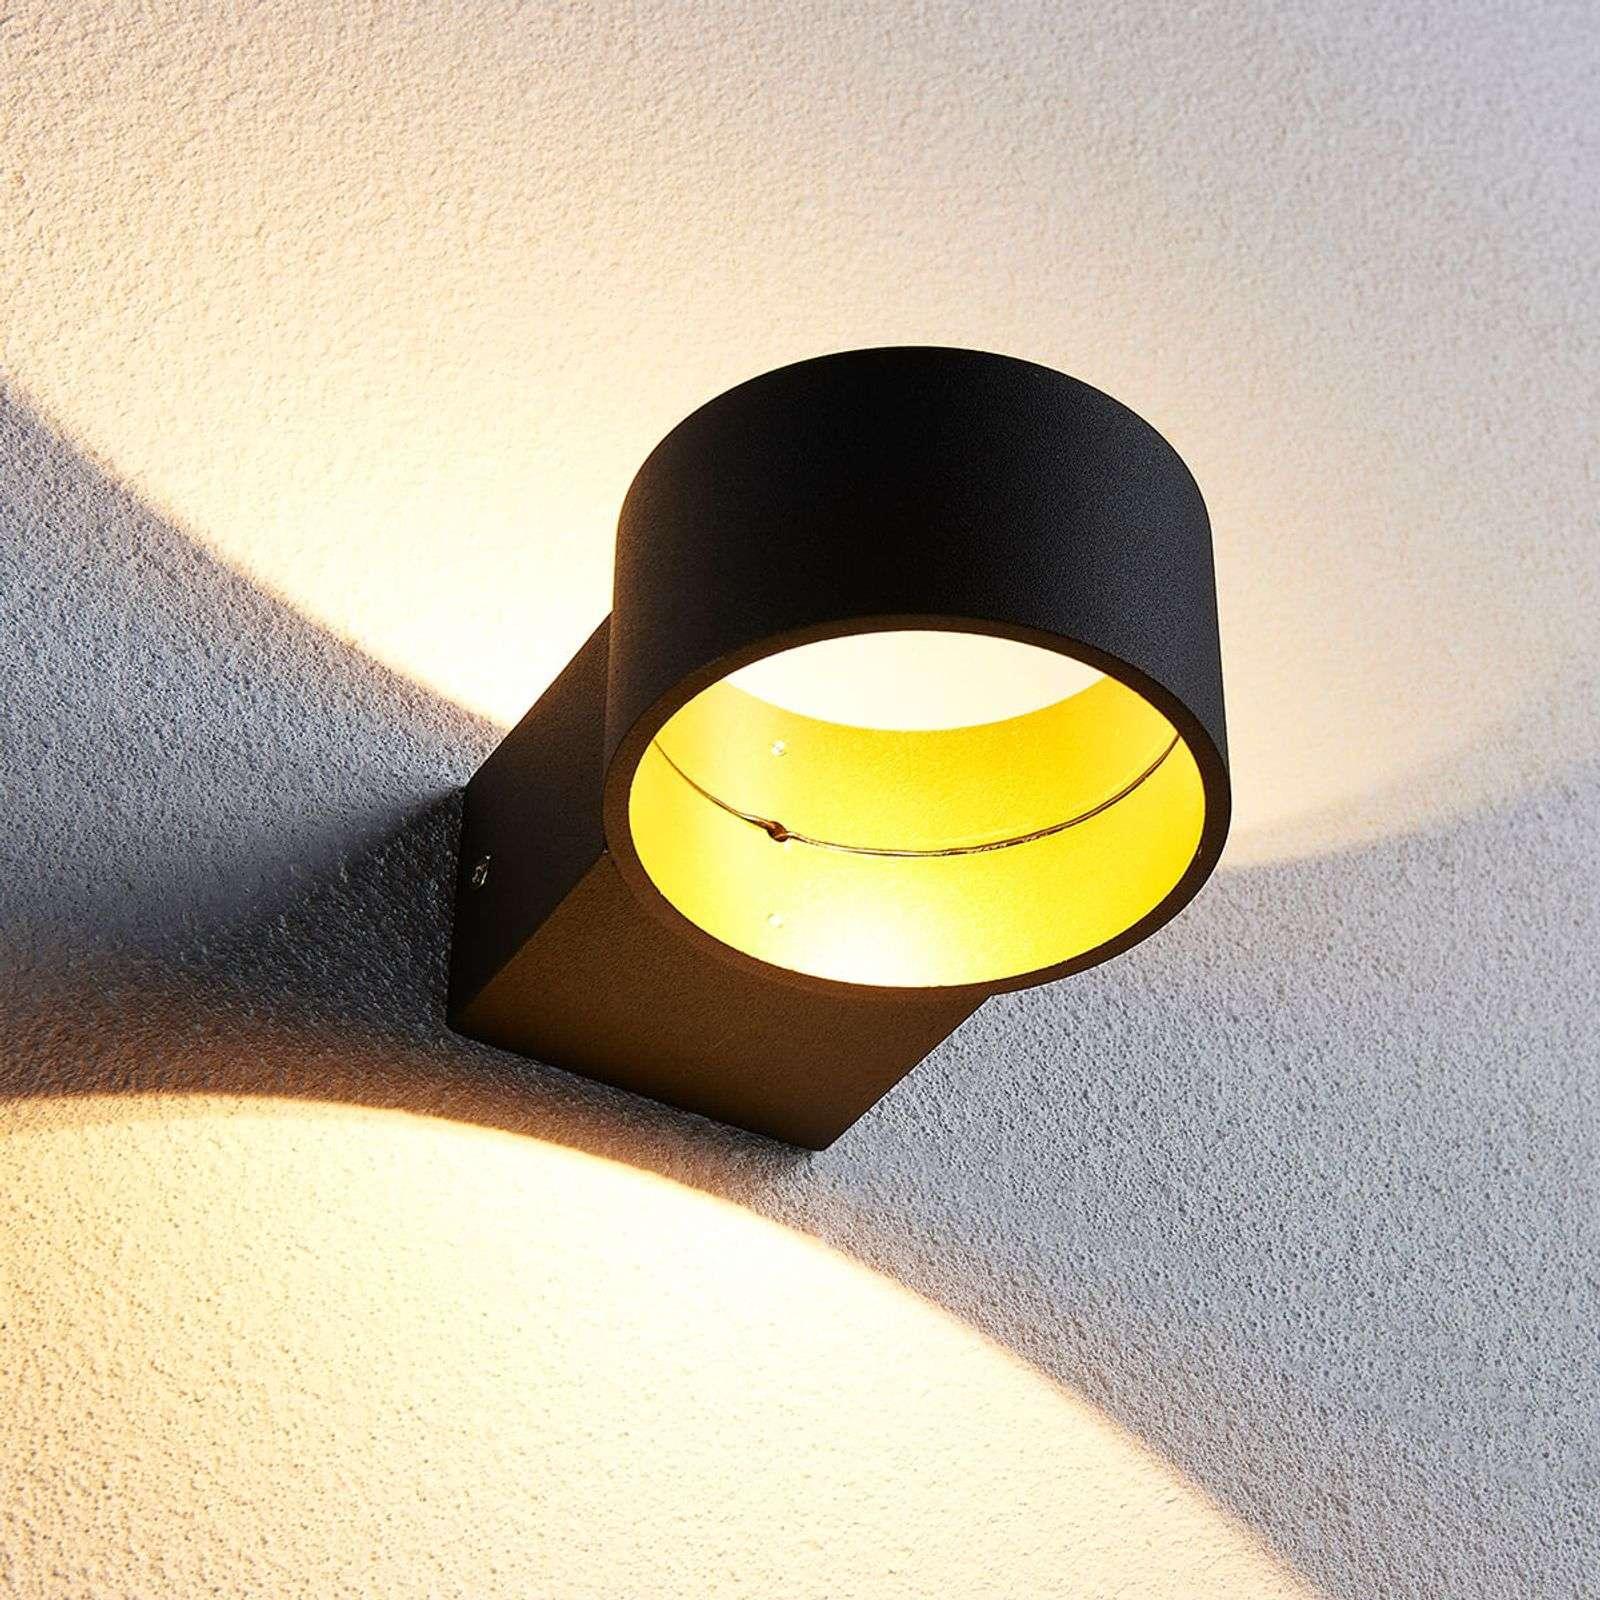 Led Wandlampe Innen